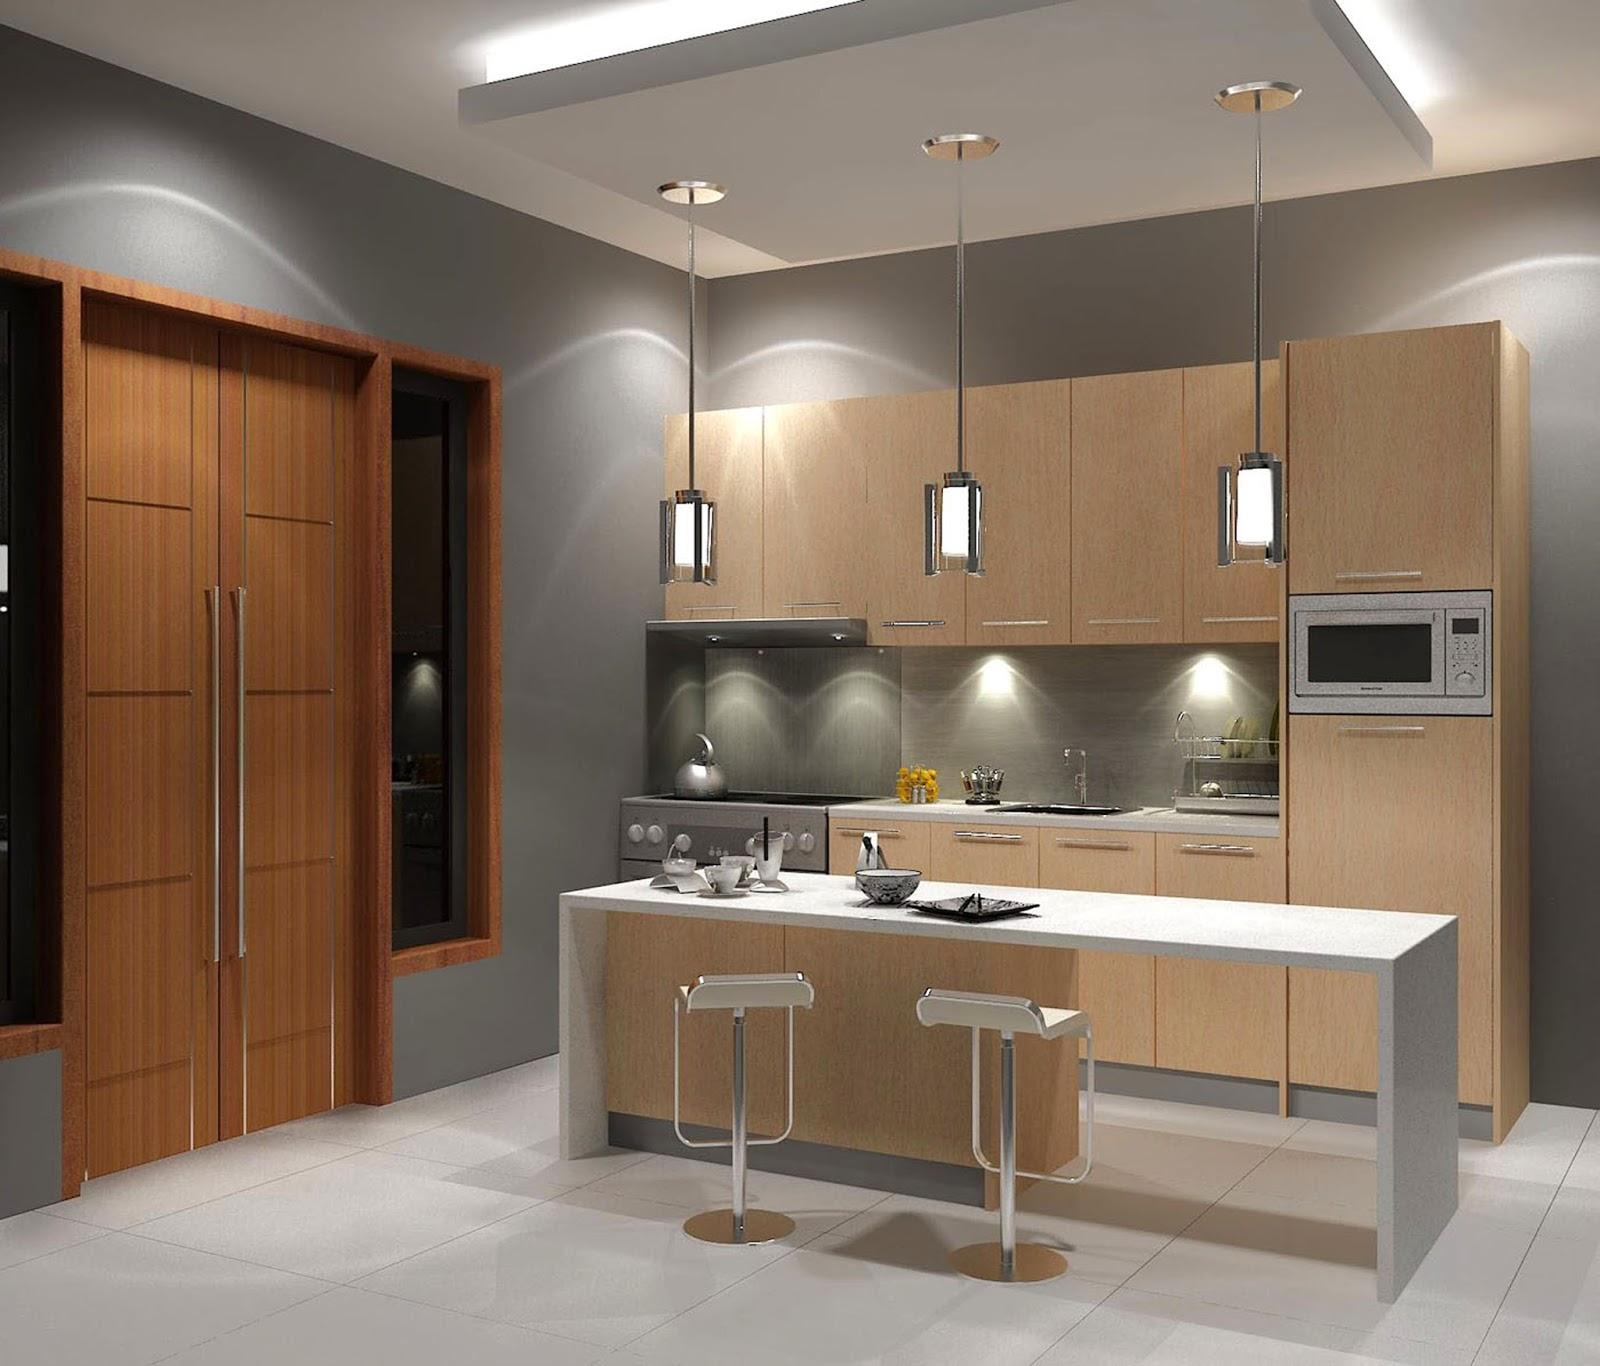 Harga hpl laminate material kitchen pantry modern minimalis tag info terbaru kami